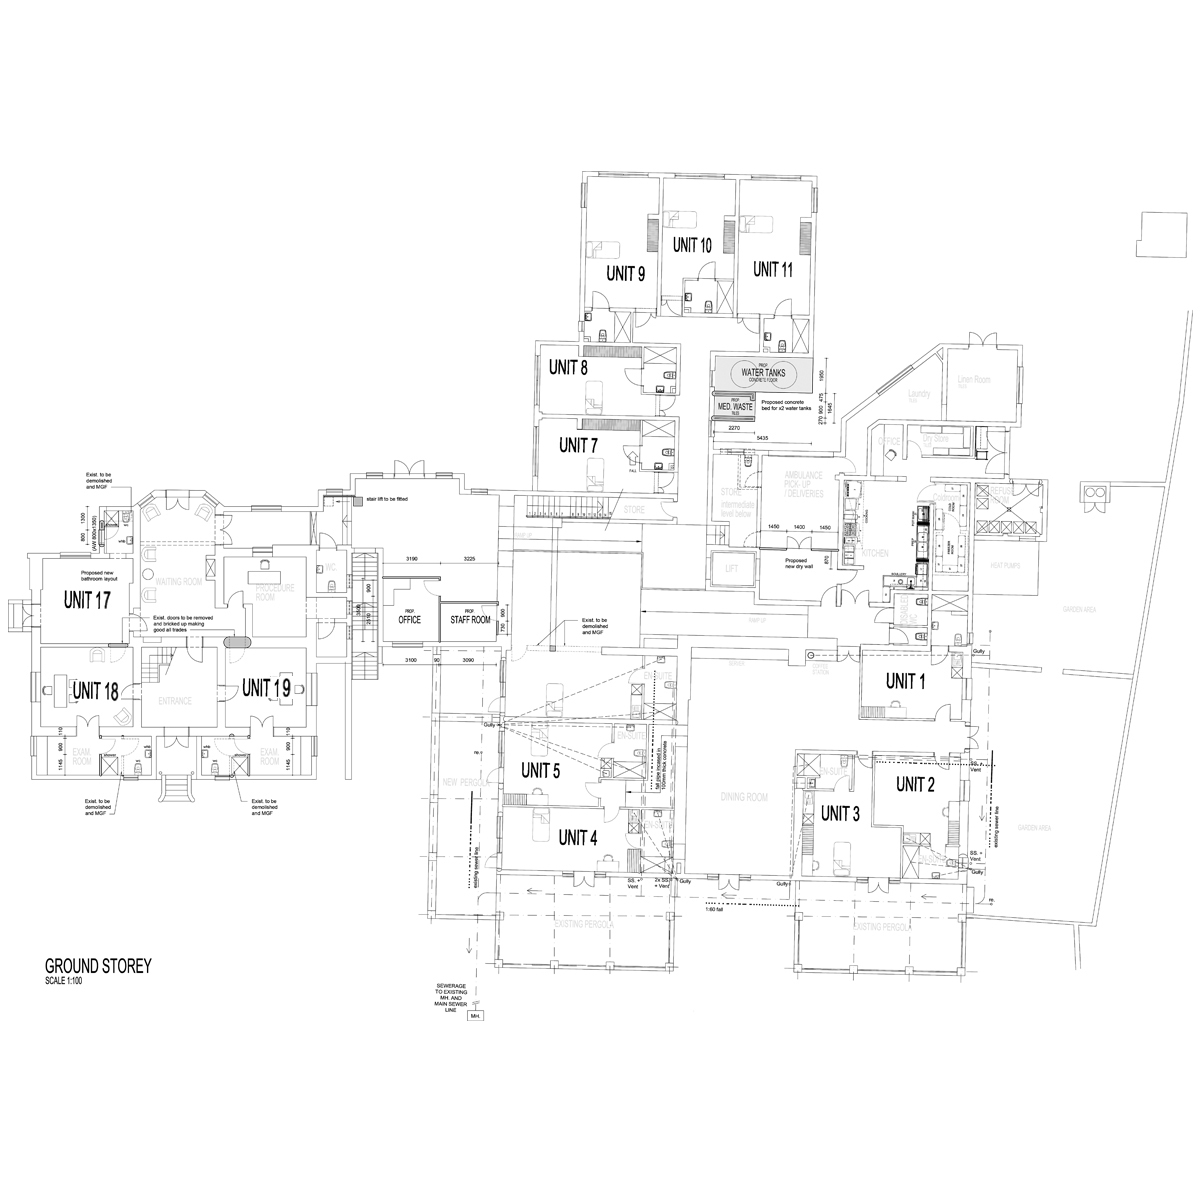 zevenwacht-vine-manor-care-centre-ground-floor_1200x1191